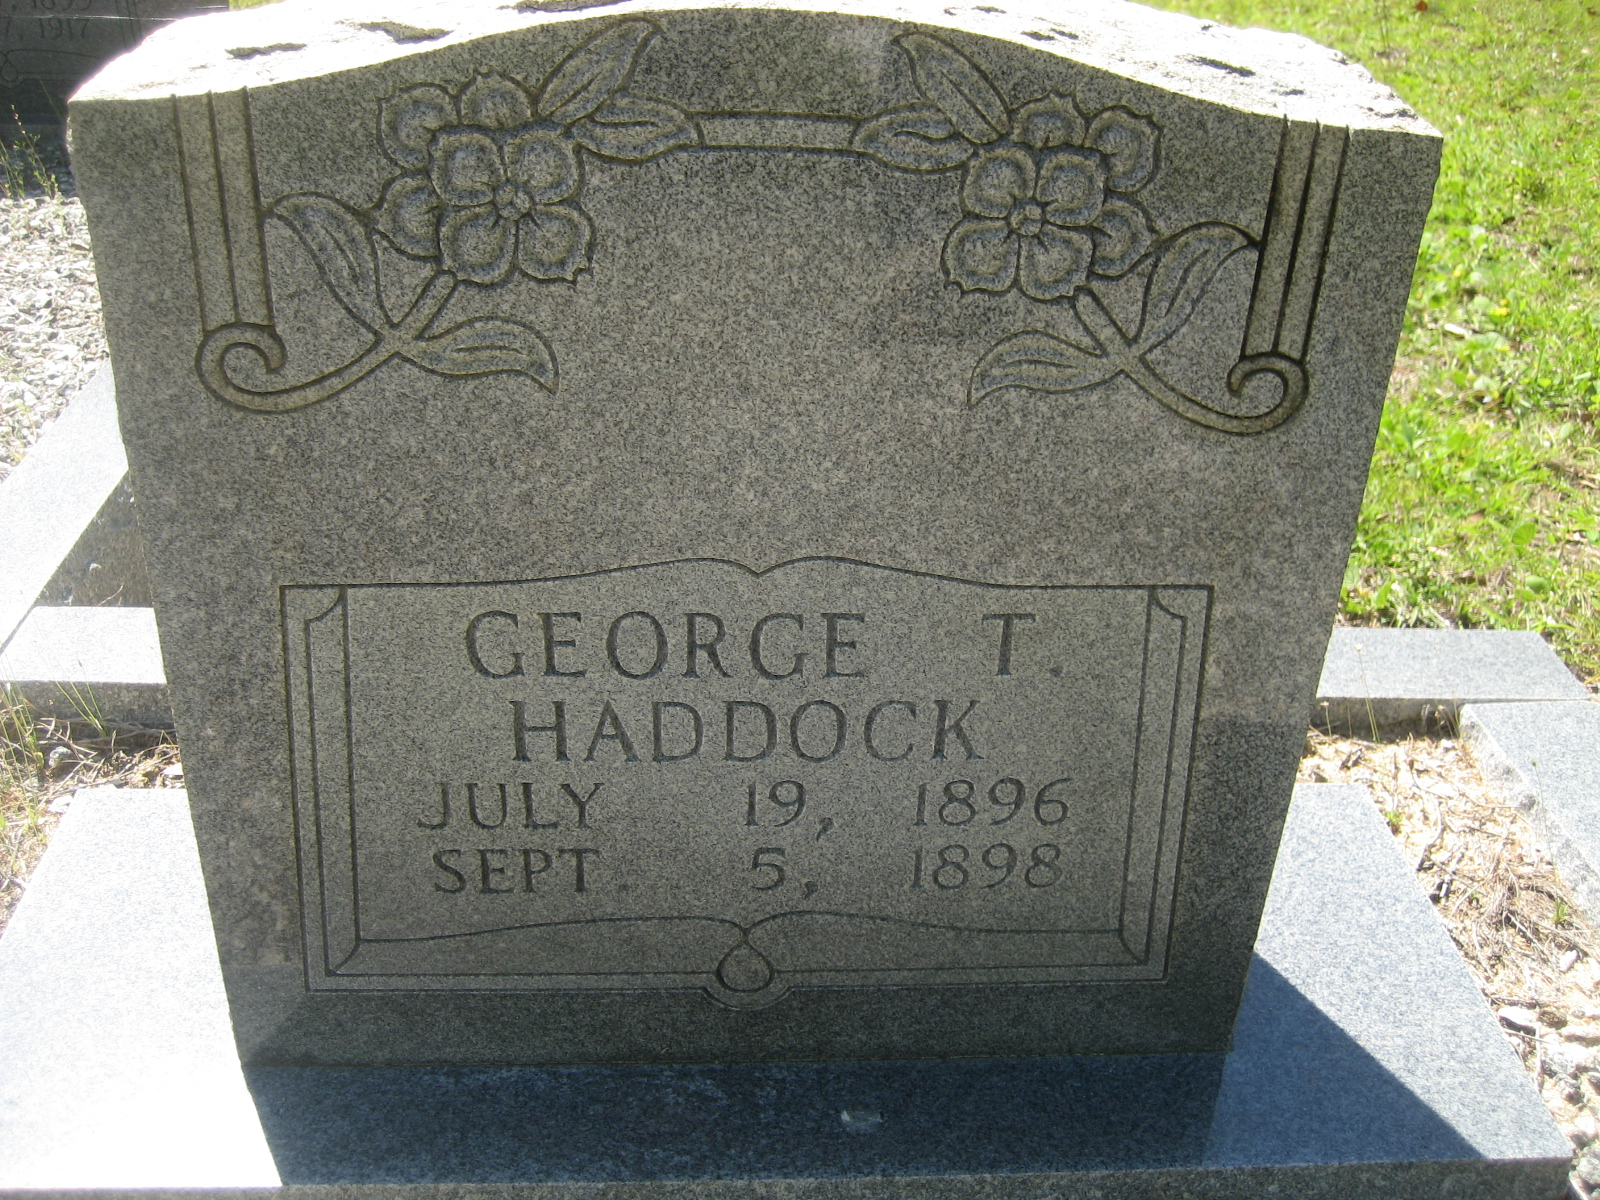 Dennis Haddock